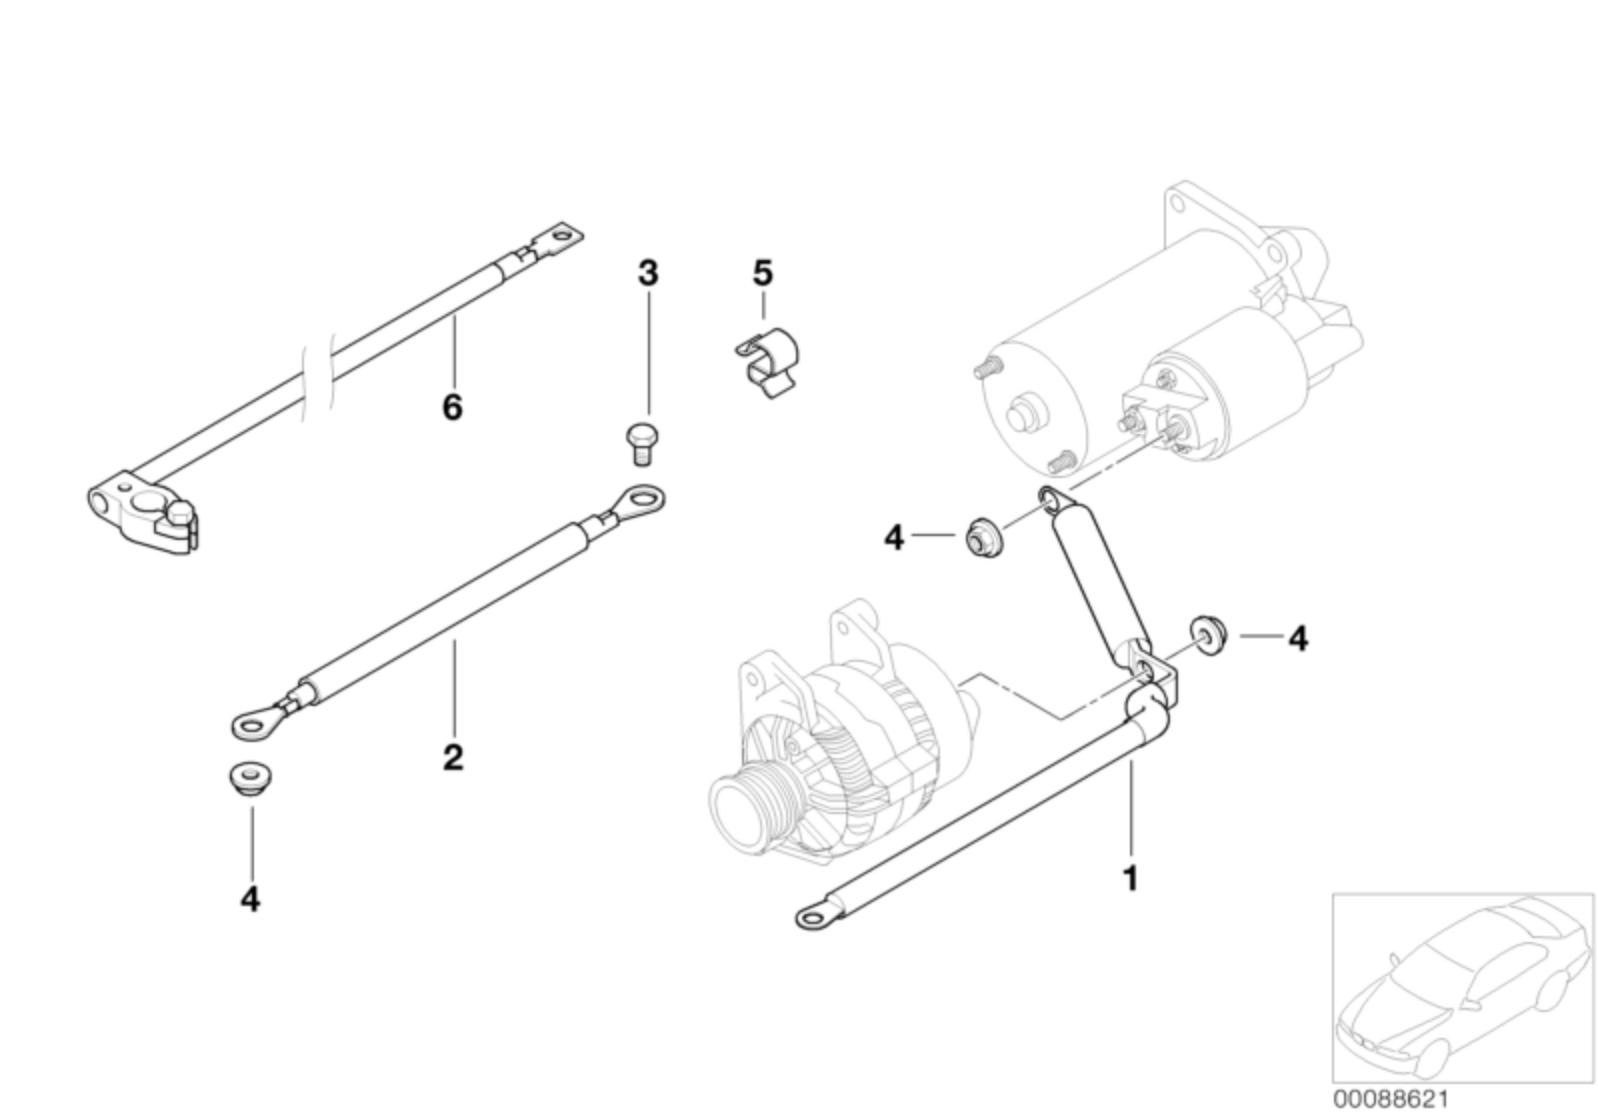 BMW Genuine 2x Hex Bolts Screws M8x16-8.8-ZNS3 Fits Most Models 07119902900